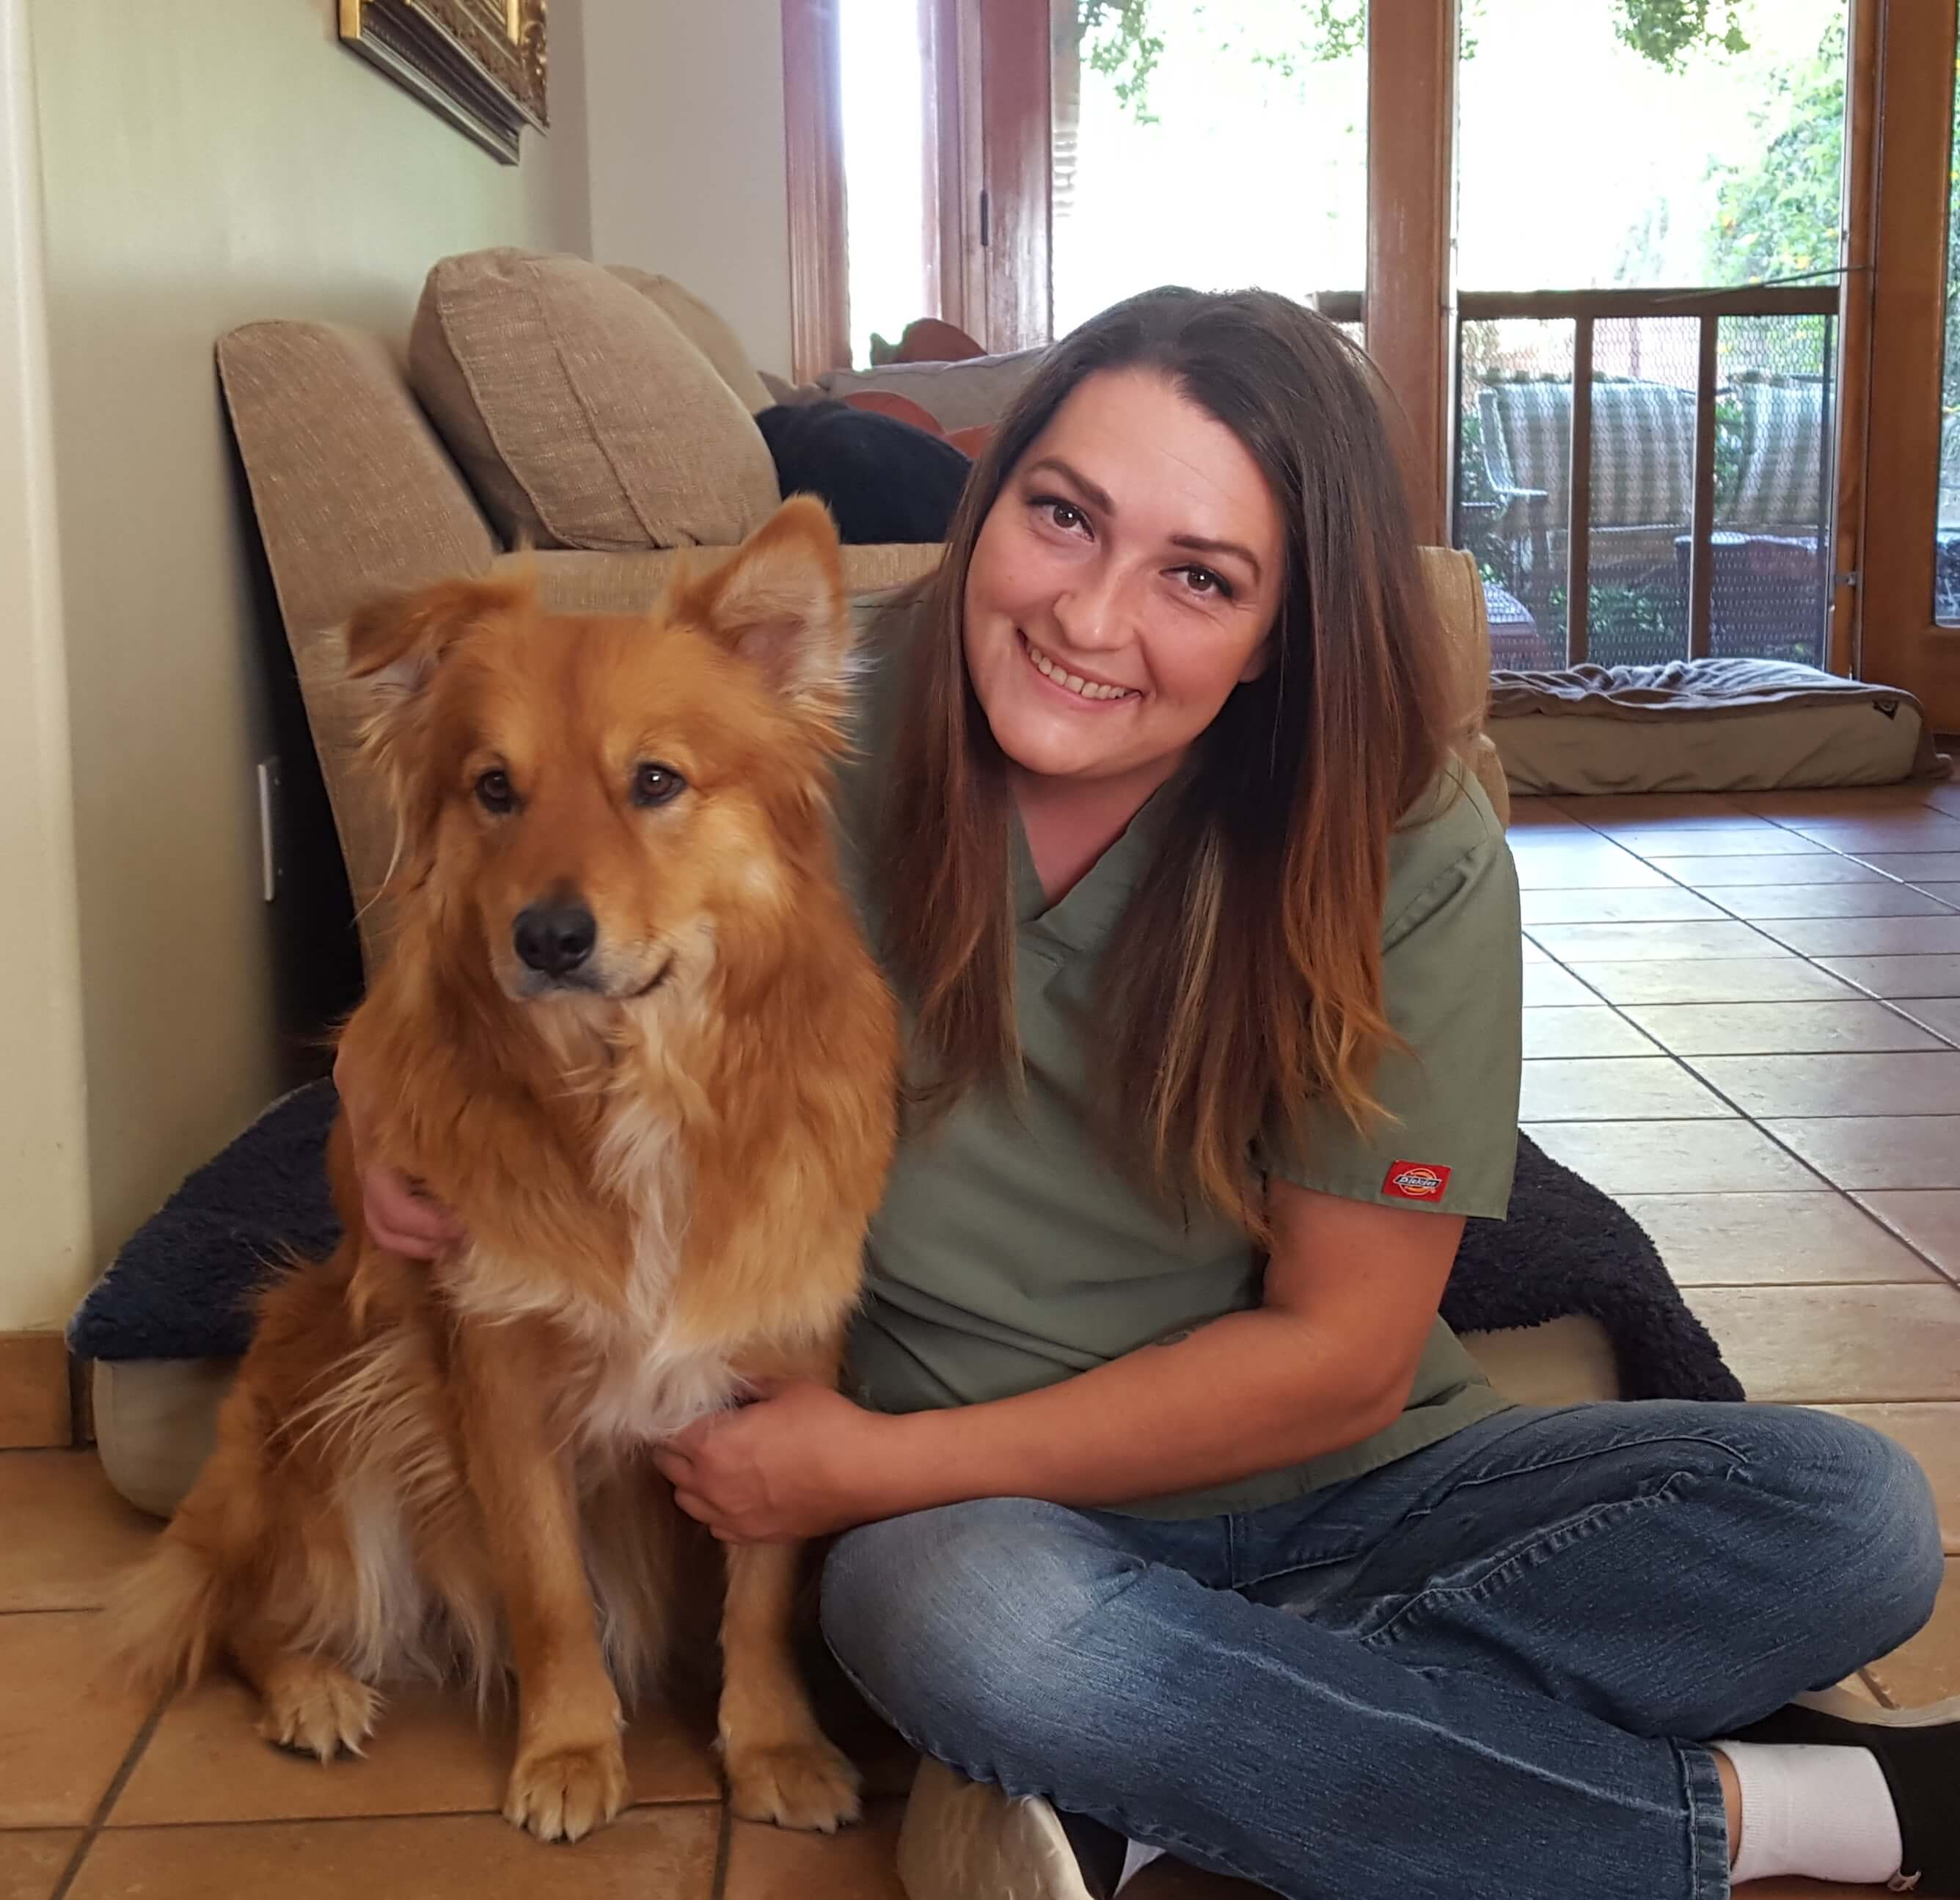 Maria from The Happy Dog Inn